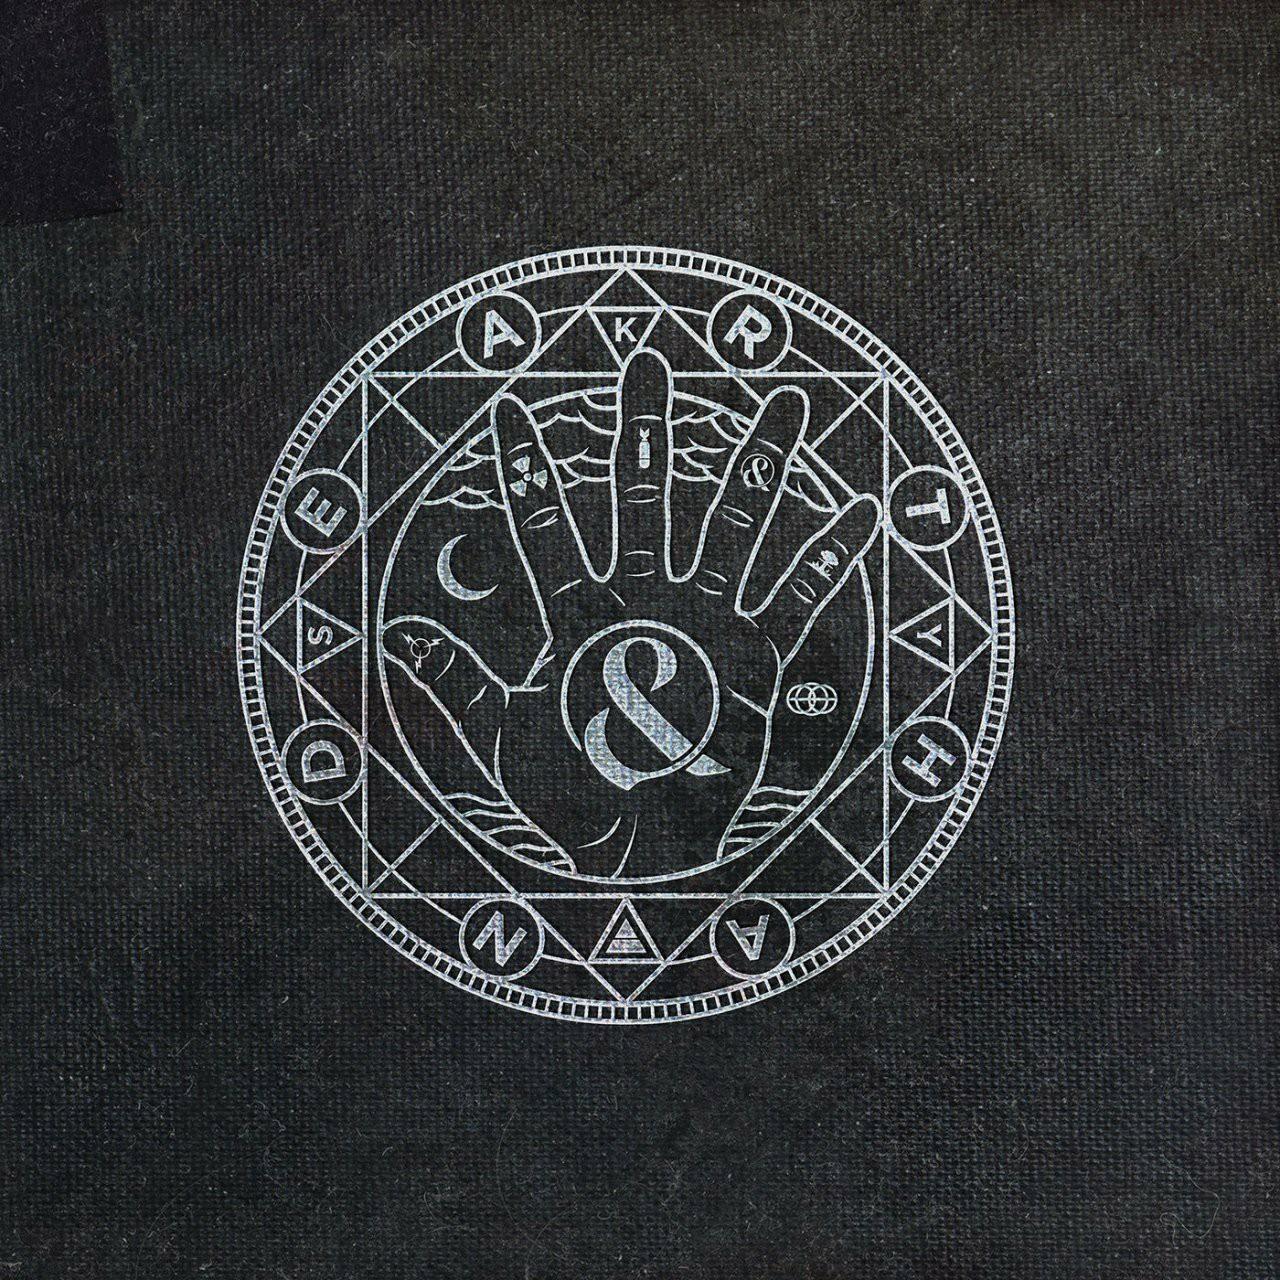 Of Mice & Men - Taste of Regret [single] (2019)